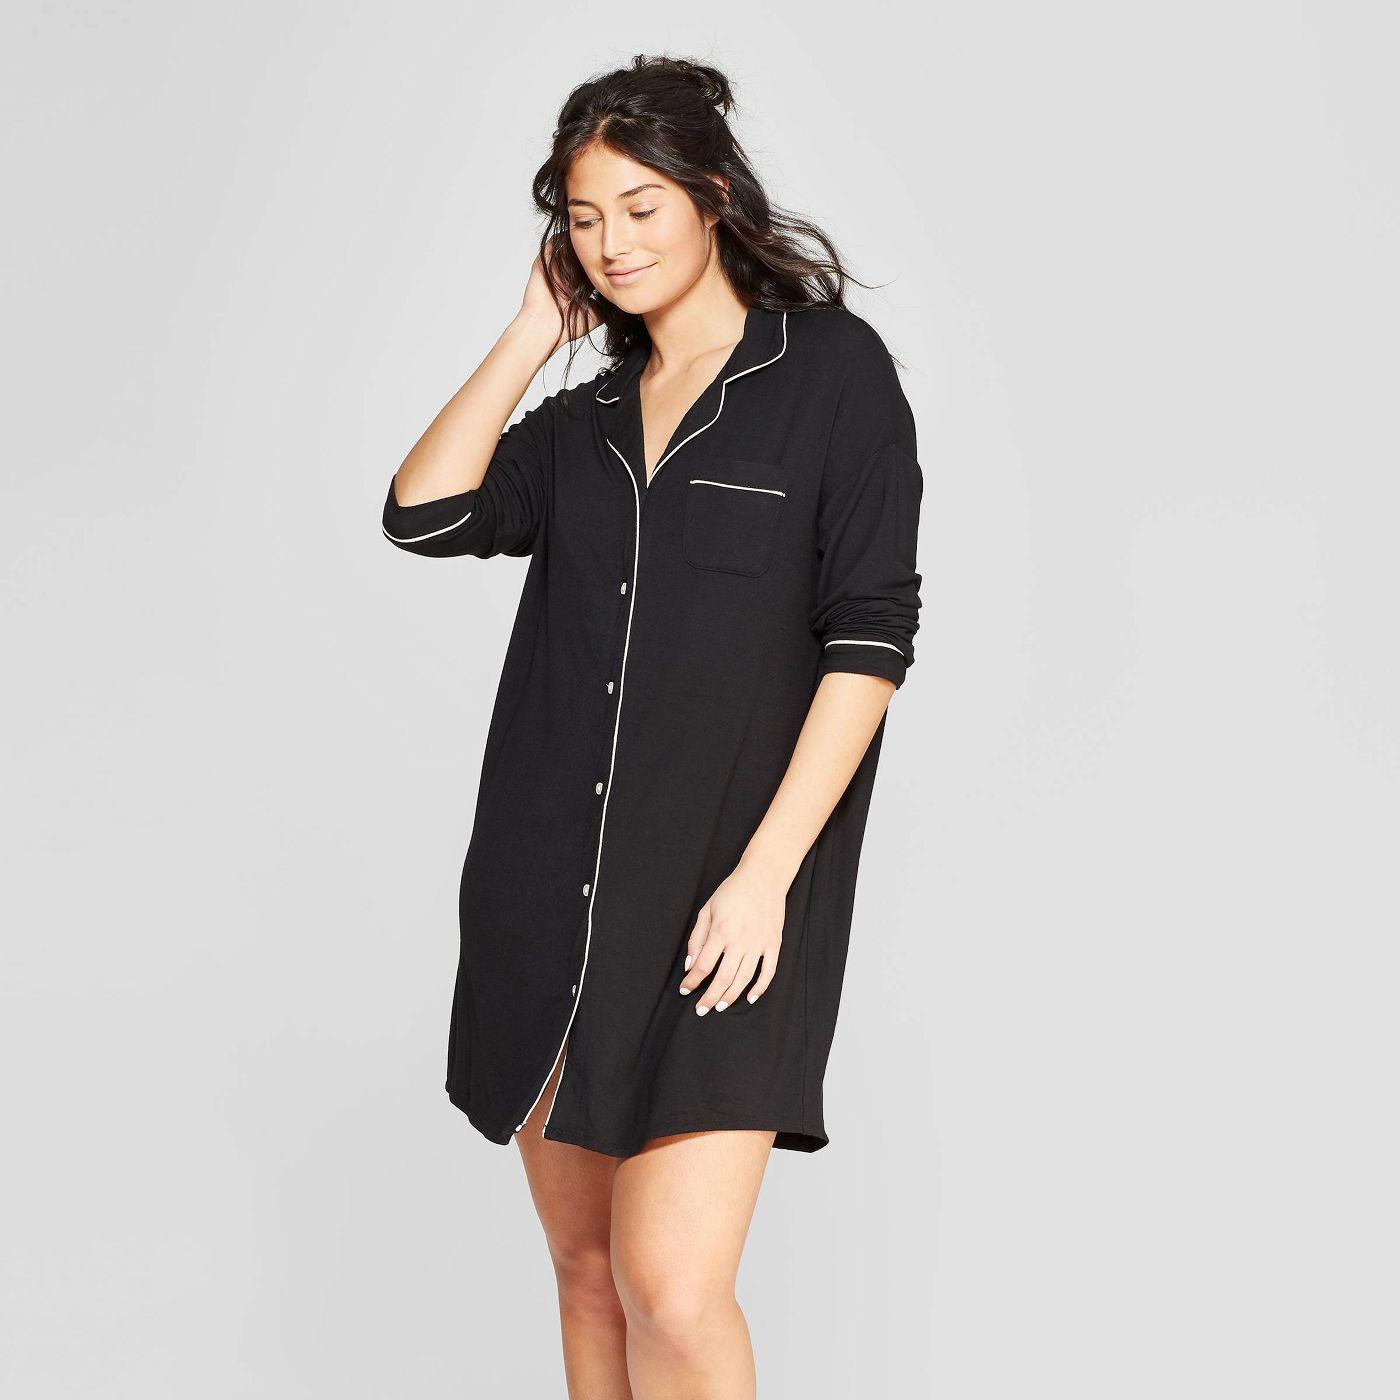 nightgown black.jpg